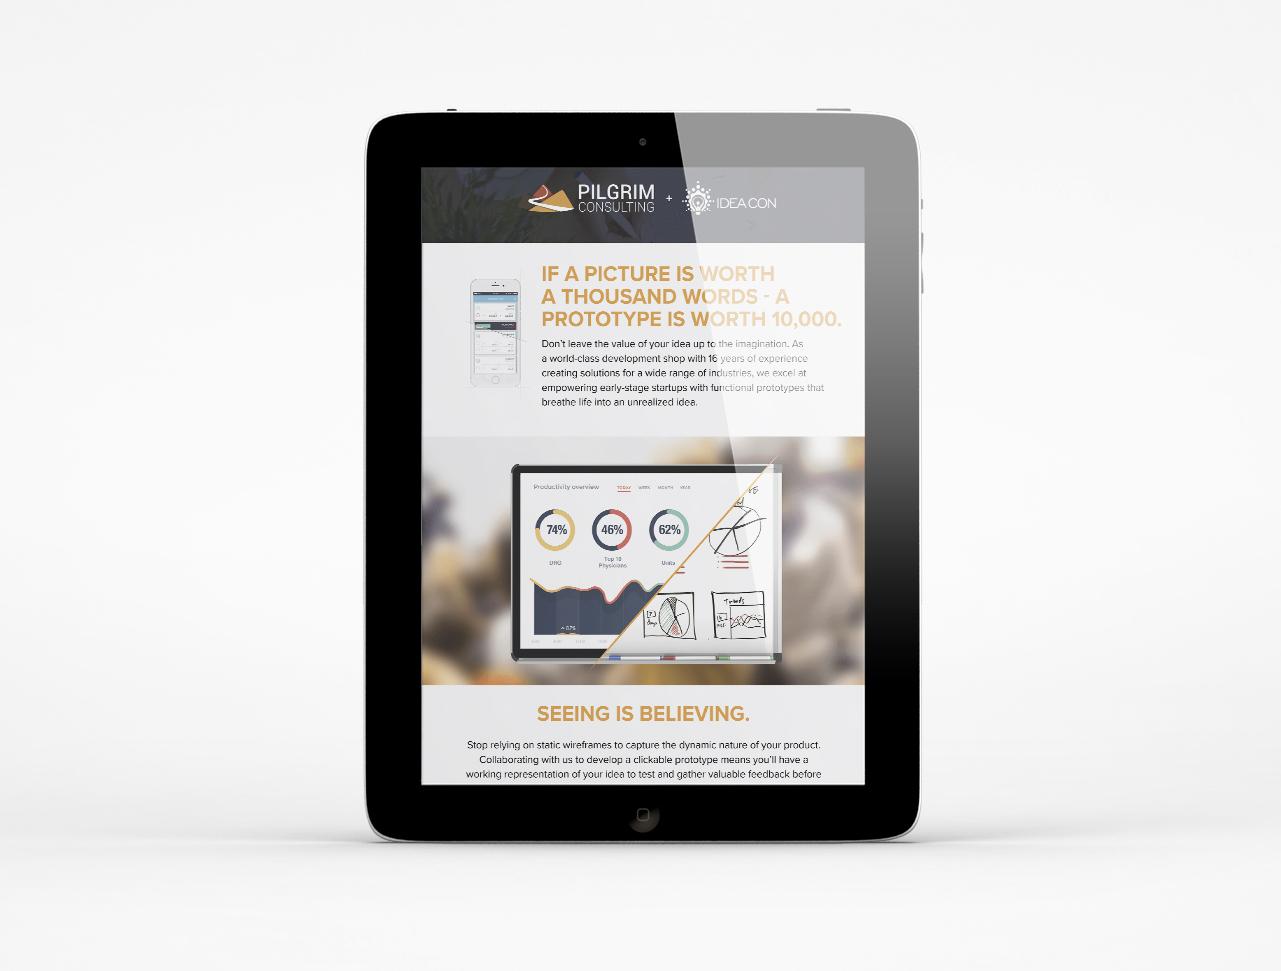 Pilgrim-ipad-presentation.jpg